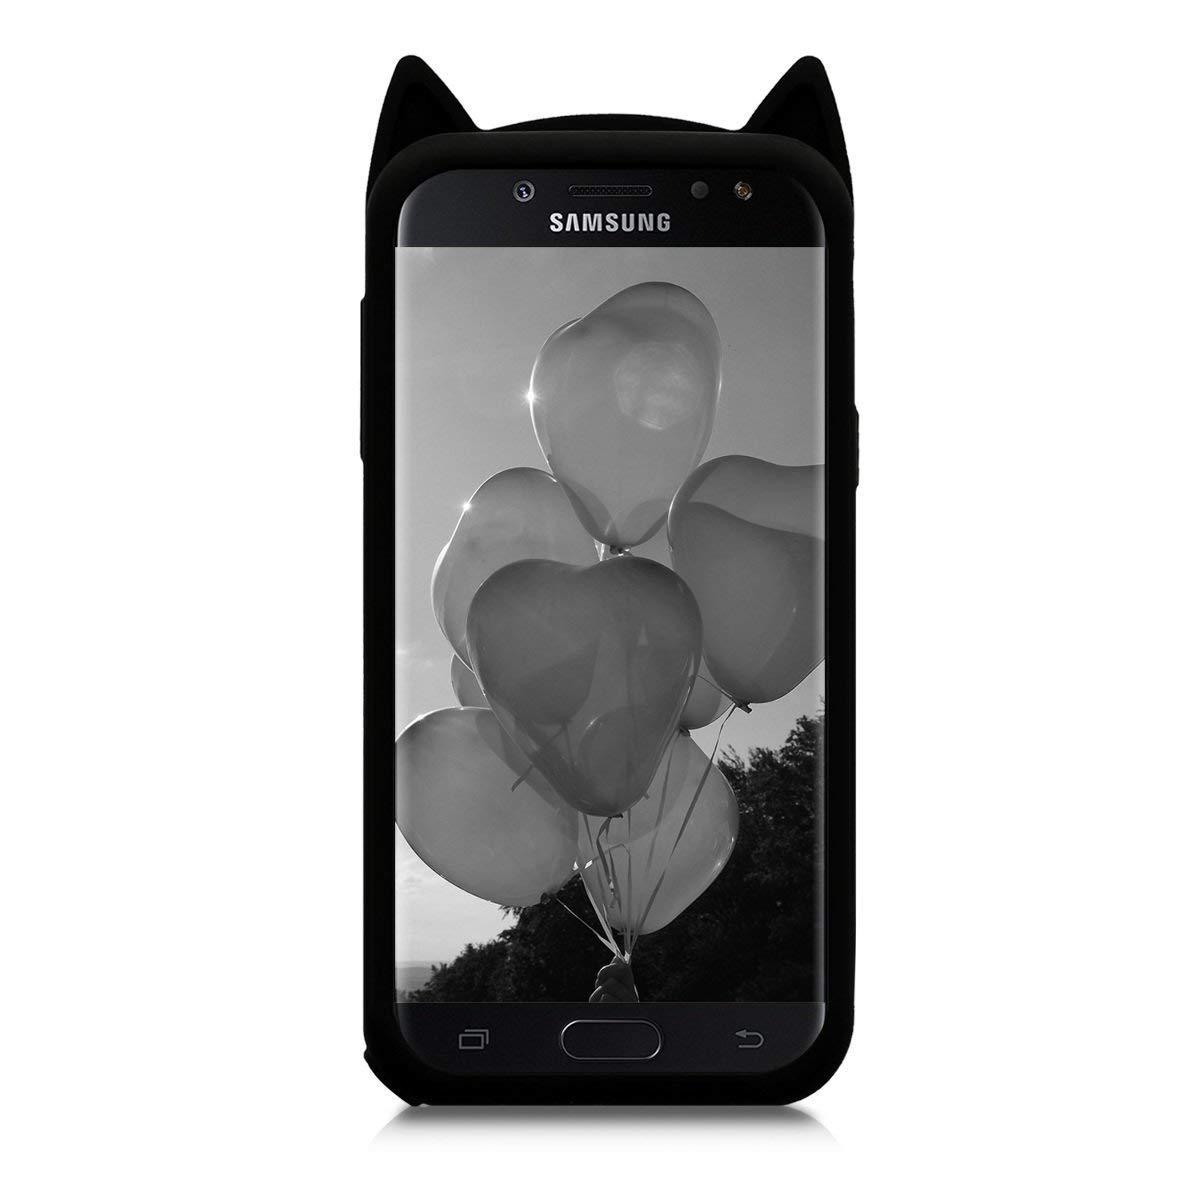 Beard Cat Case for Samsung Galaxy Amp Prime 3,J3 Eclipse 2/J3 Orbit/J3 Achieve J3 Emerge 2018 Soft Fun Kawaii Character Unique Girls Kids Silicone ...